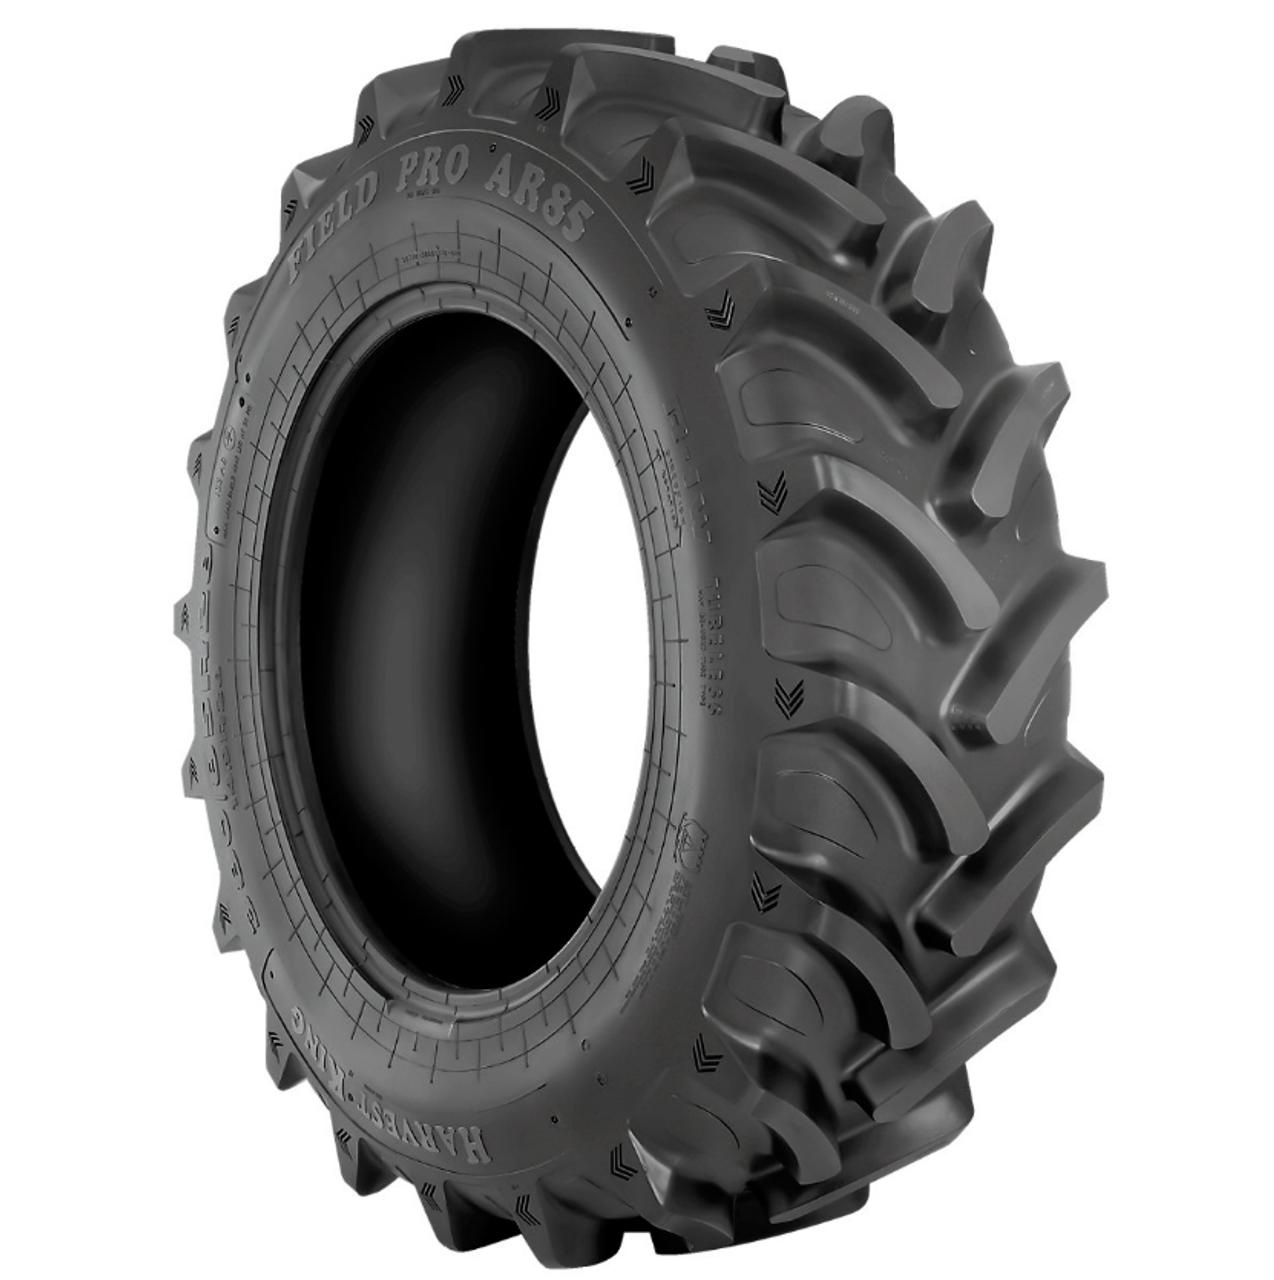 380 90 46 Harvest King Radial R1W 14.9R46 Sprayer Field Pro 85 New Tire